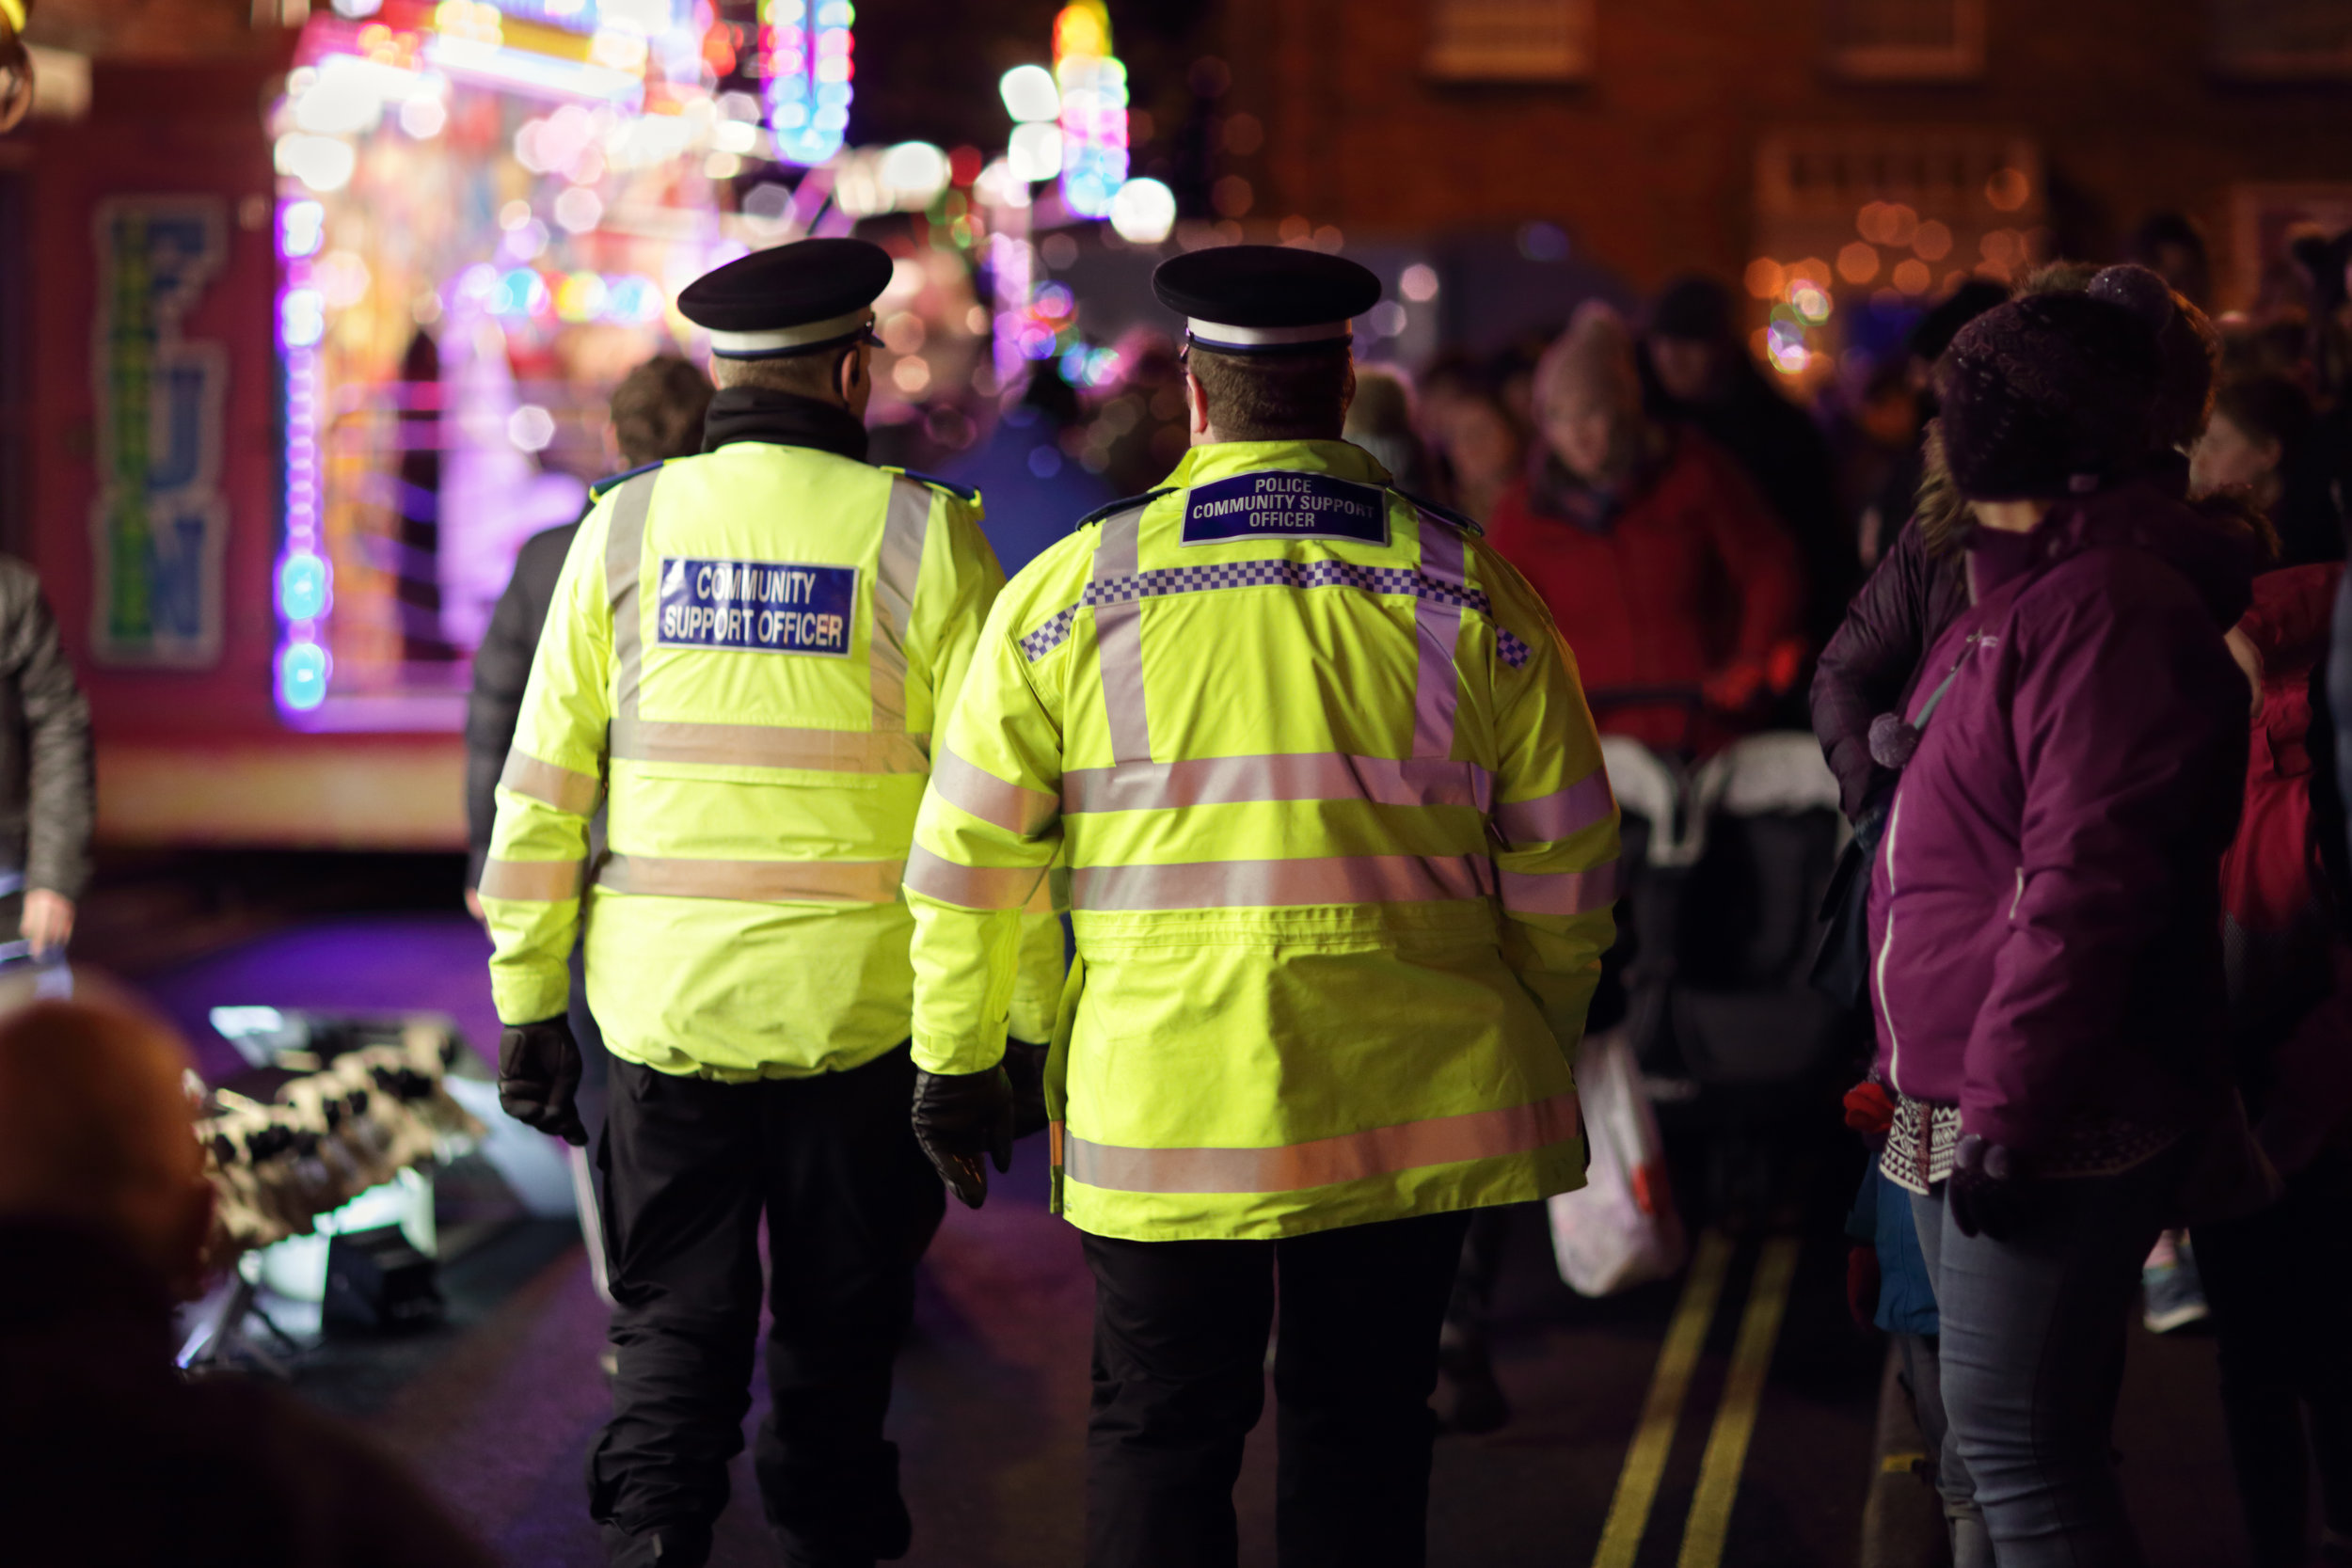 british-police-community-support-officer-P8GCNAS.jpg